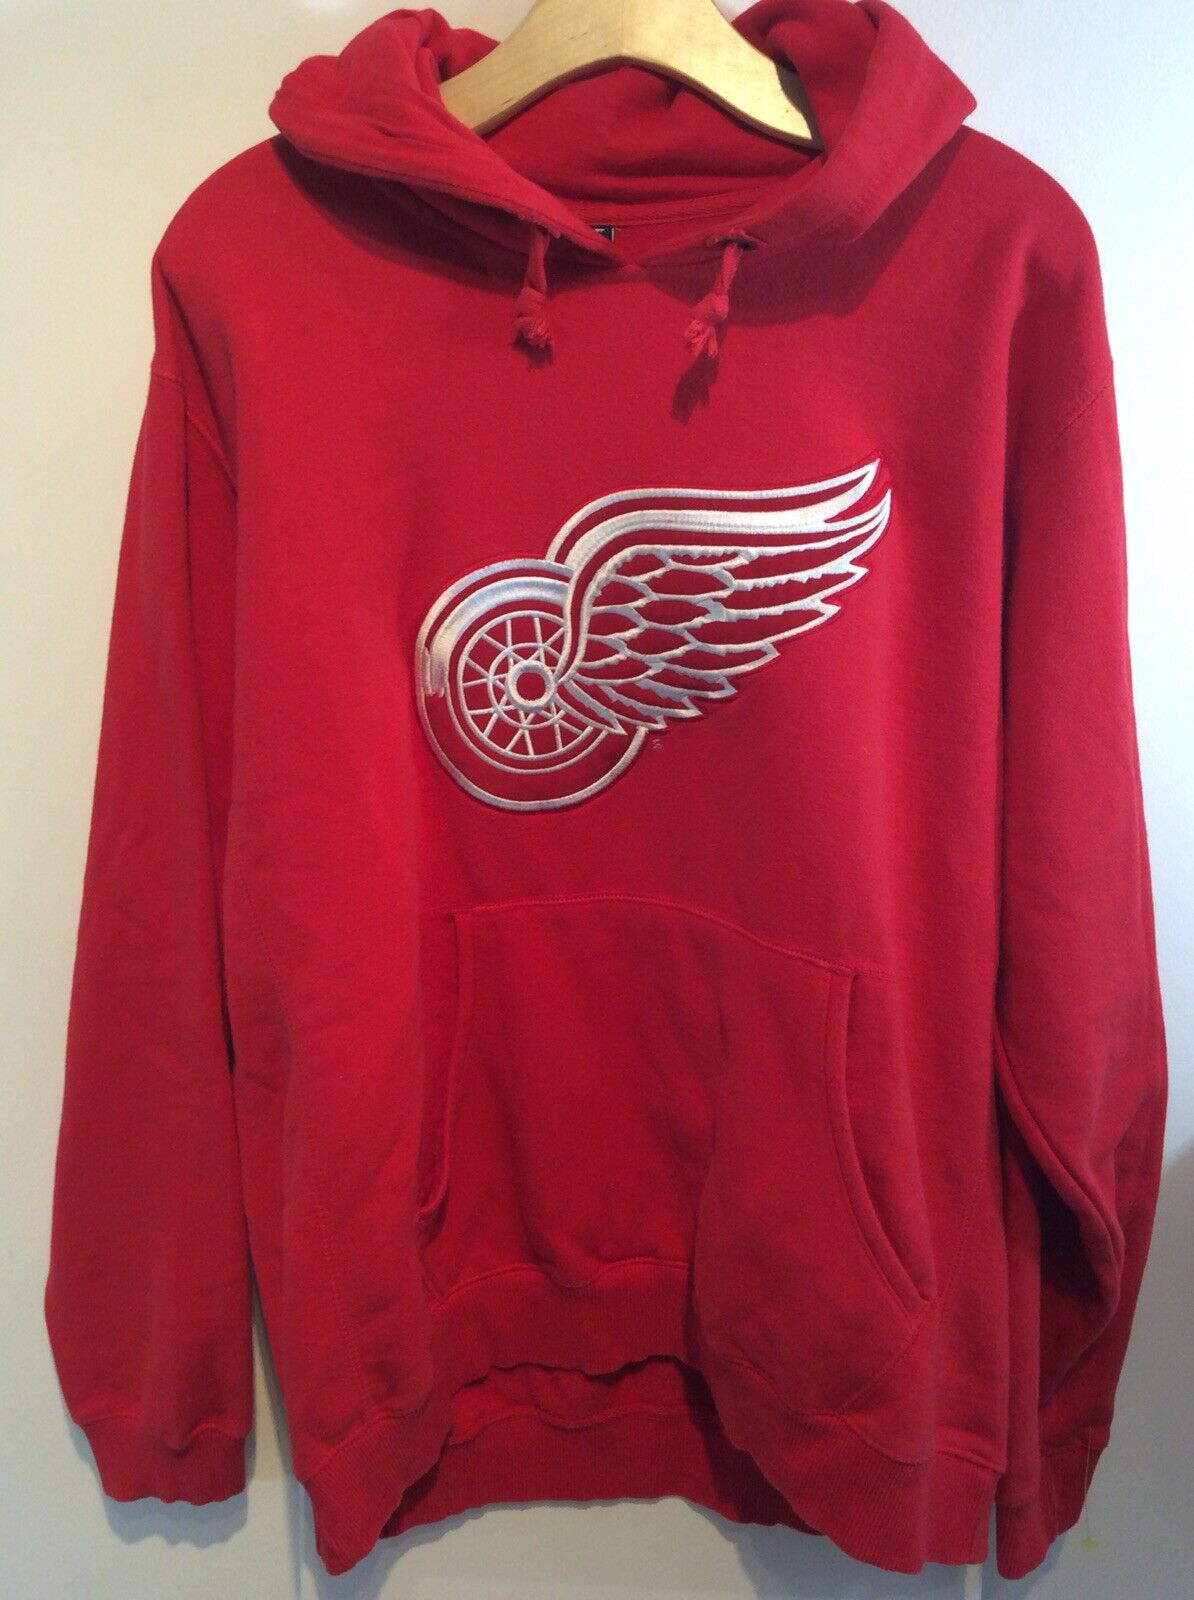 Detroit rot Wings Authentic Sweatshirt NHL Stitched Hockey XL EUC Rare